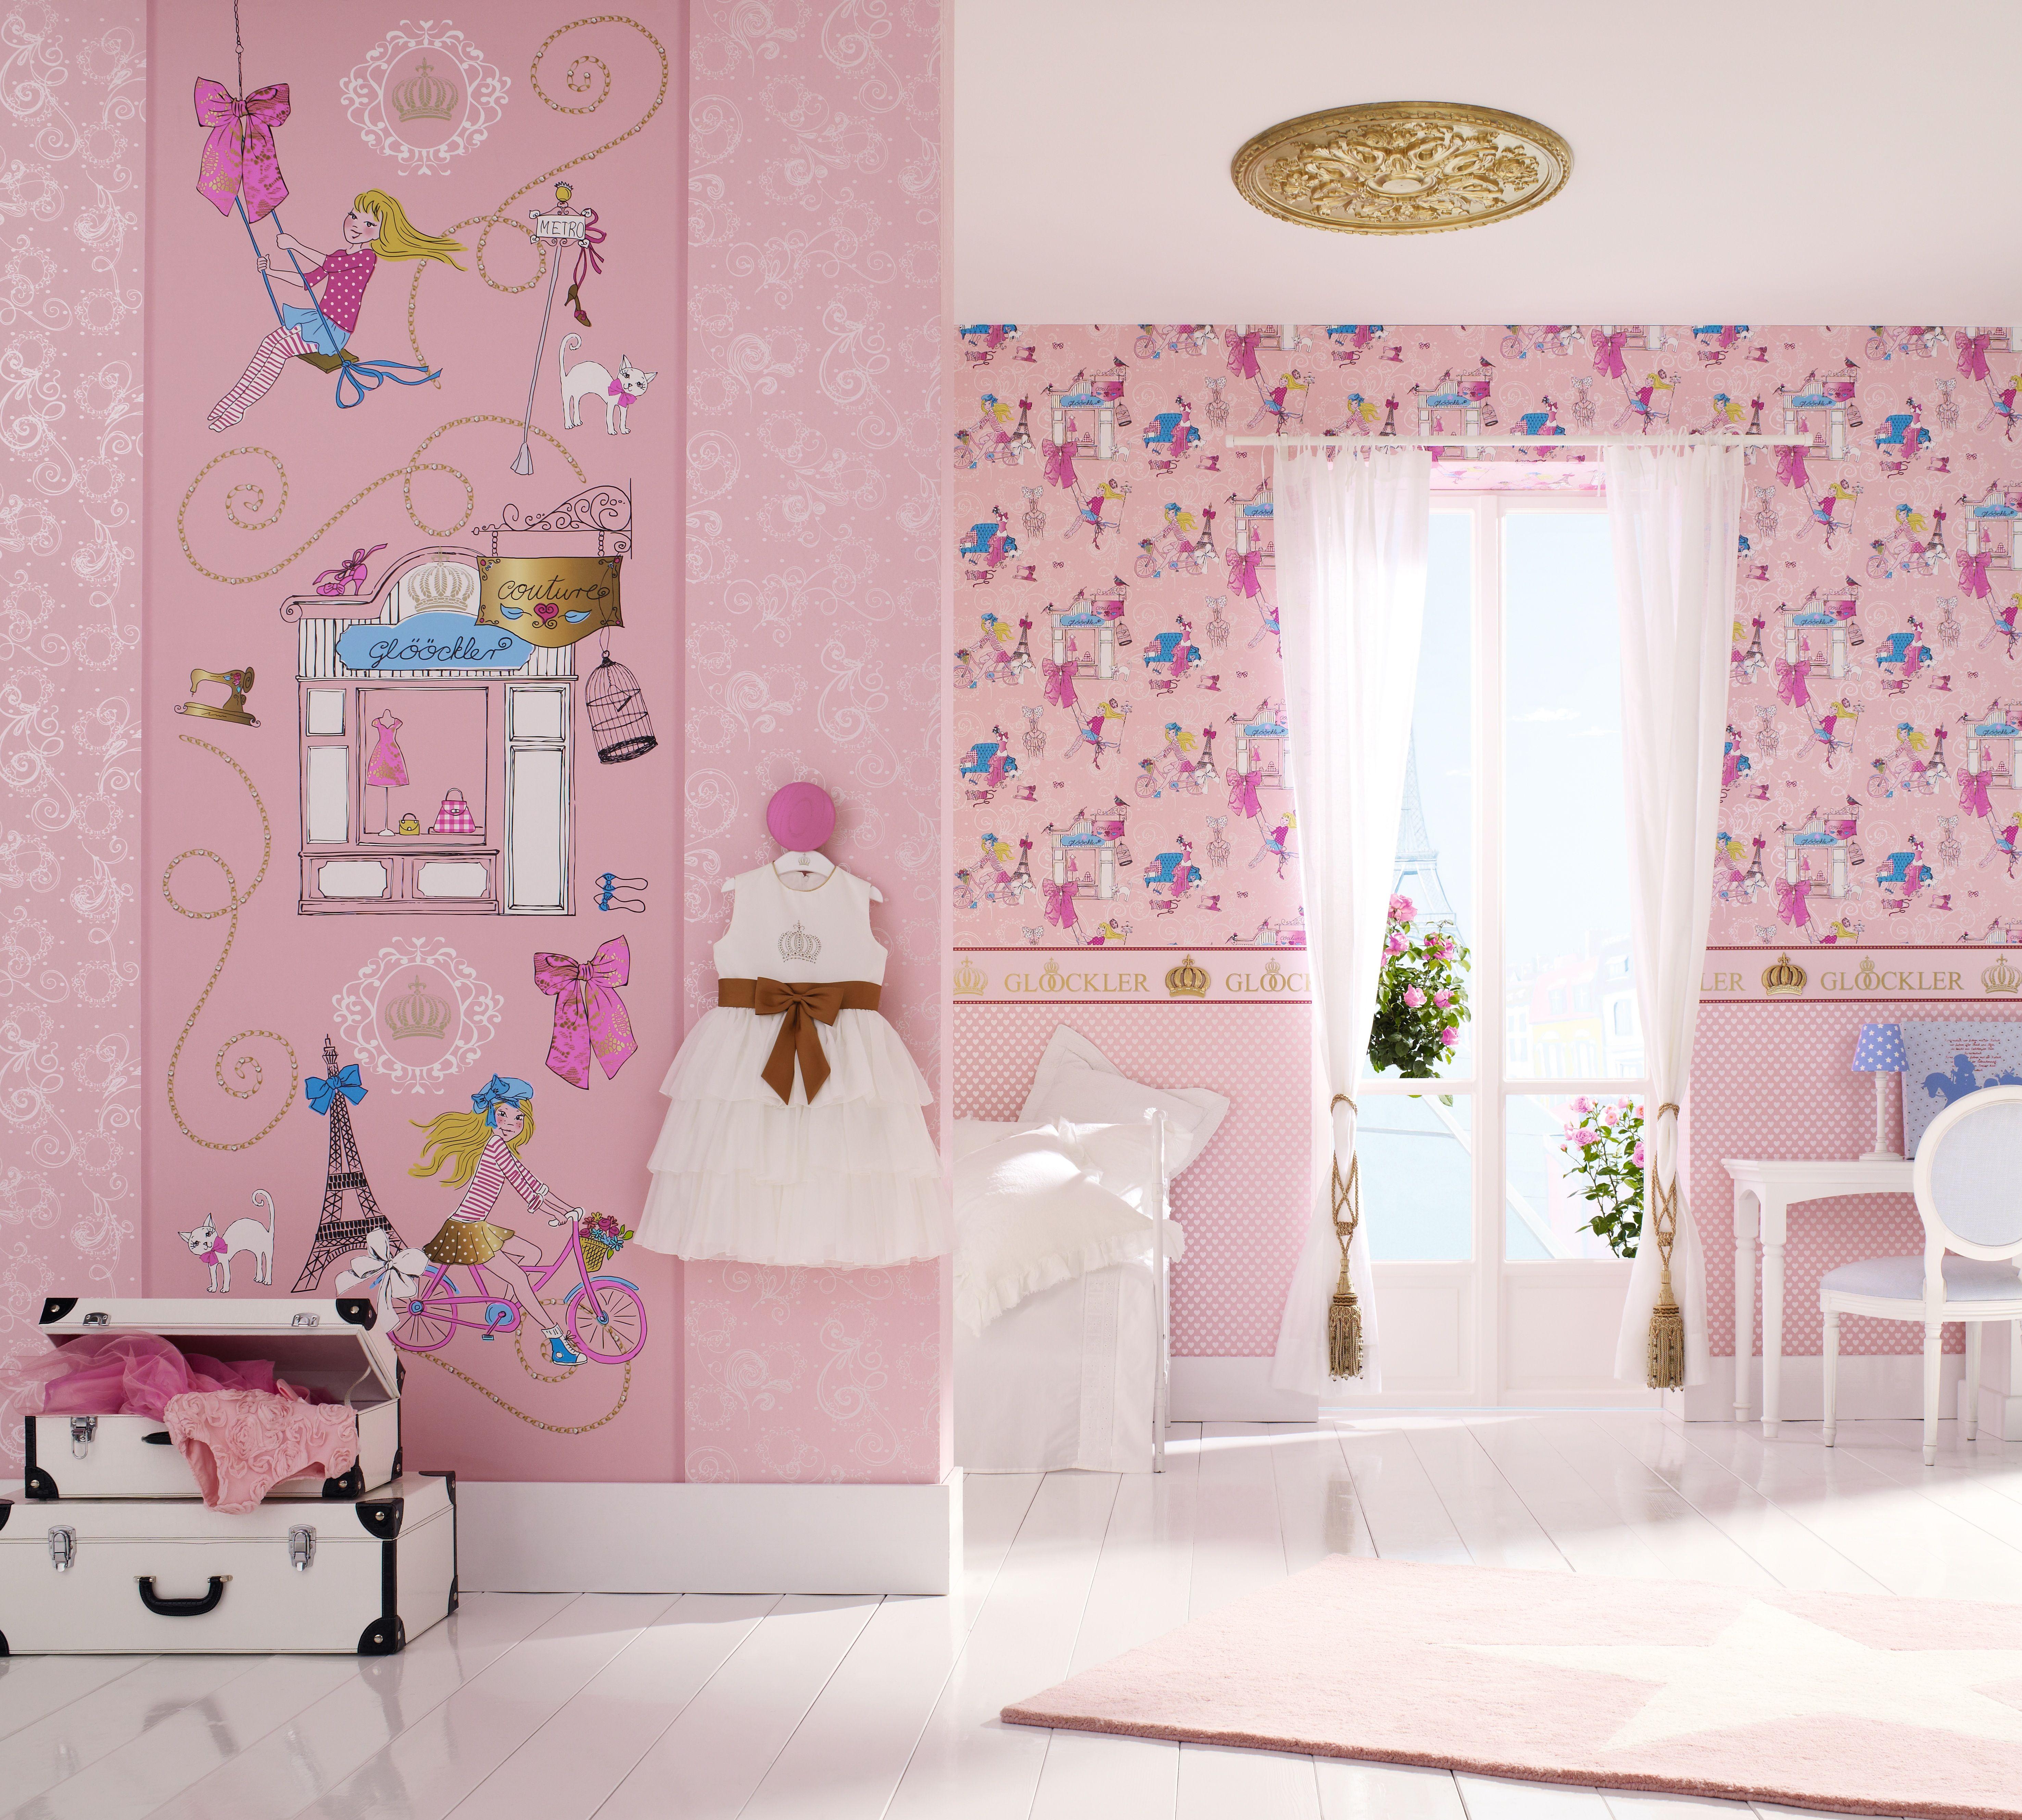 Marvelous Tapetendesigns f r Kinderzimmer Neue Kollektion Kinderttapeten u CHILDRENs PARADISE von Harald Gl ckler Die